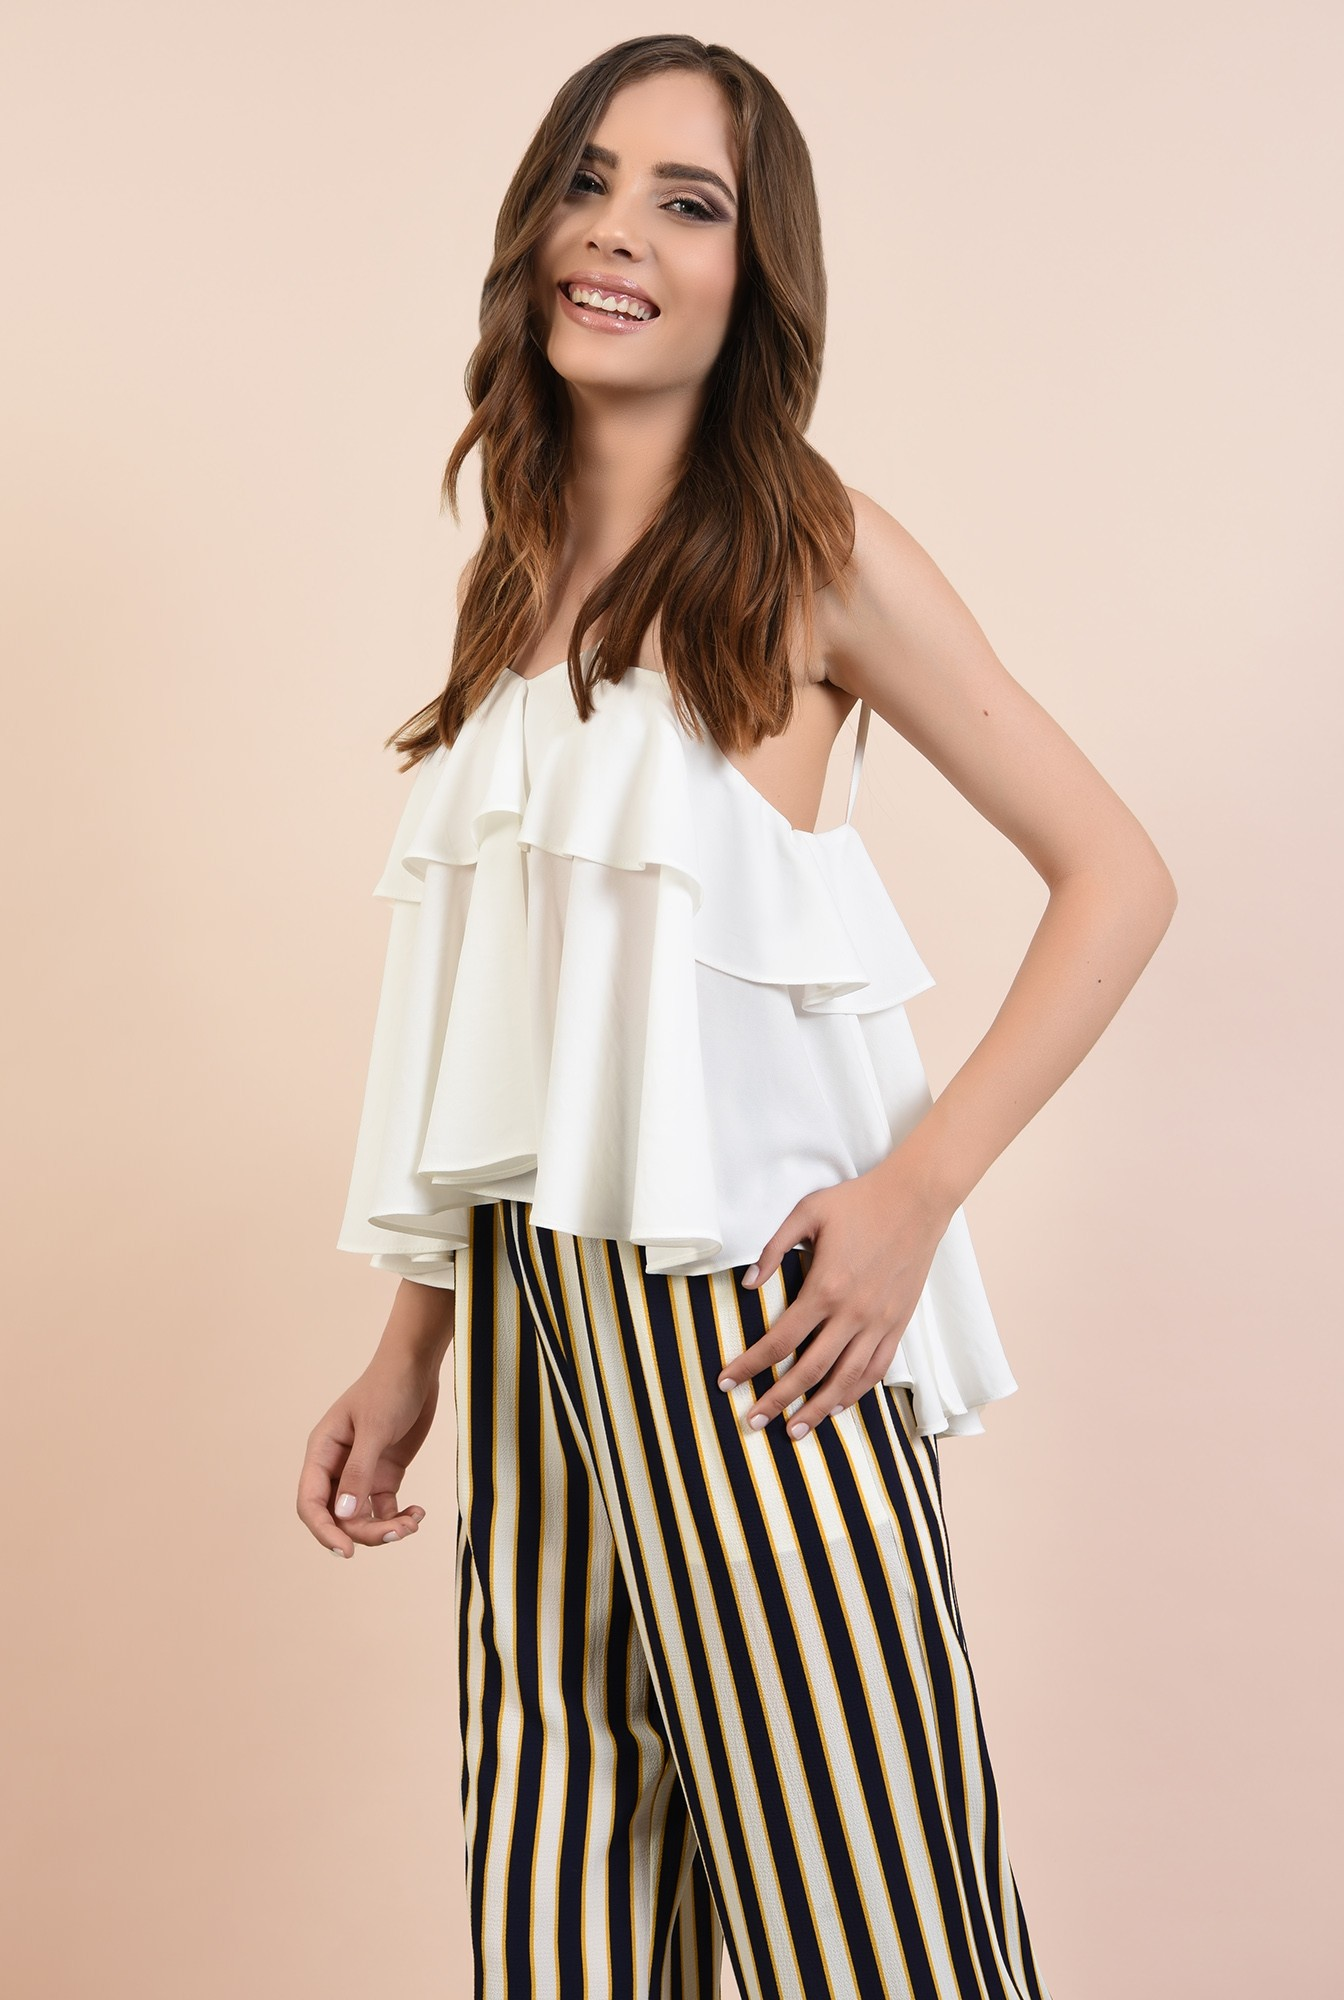 2 - 360 - pantaloni de zi, croi larg, dungi multicolore, betelie elastica